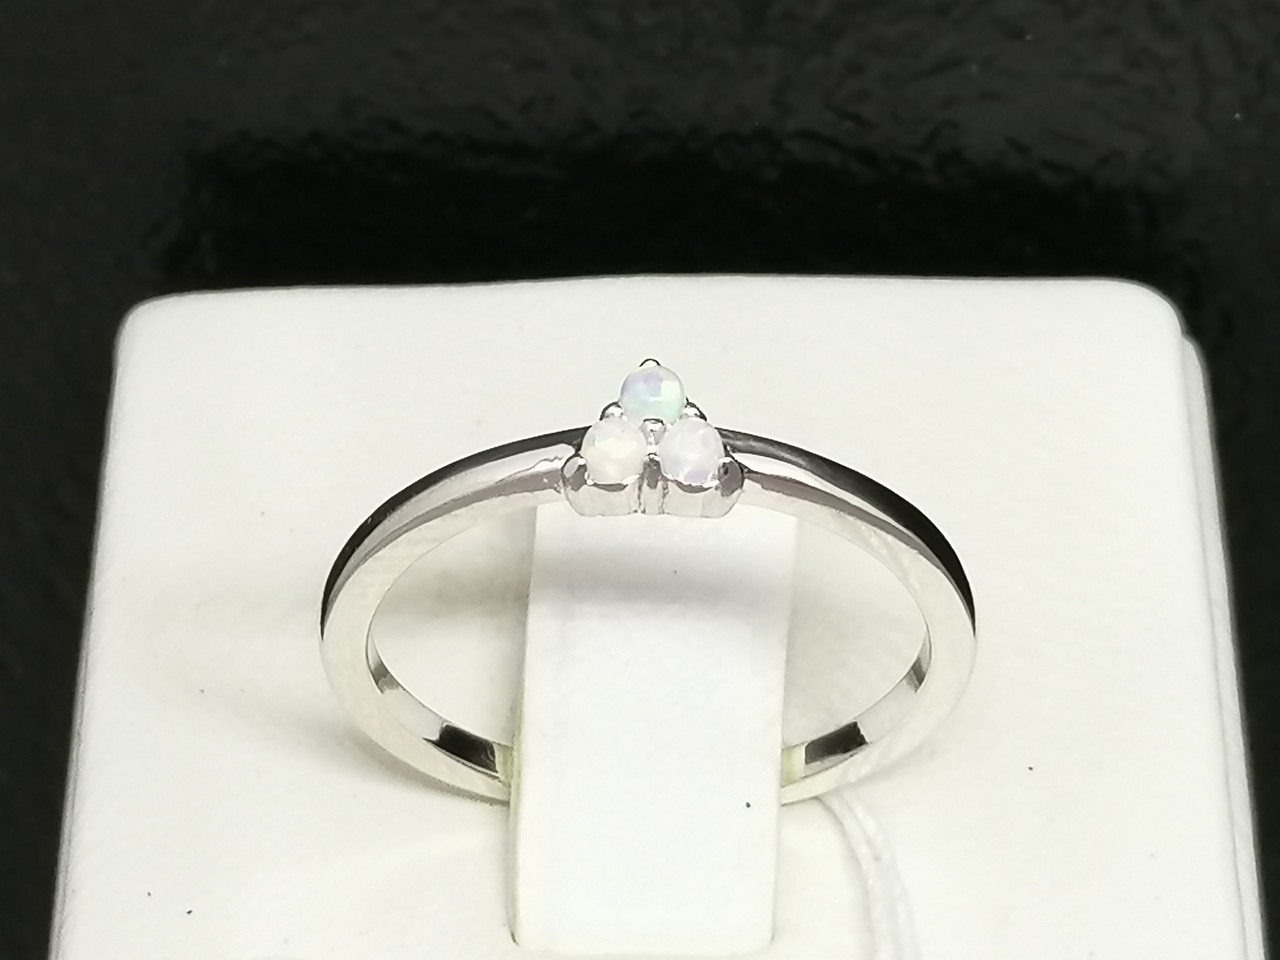 Серебряное кольцо с опалом. Артикул К2ОПБ/1337 16,5